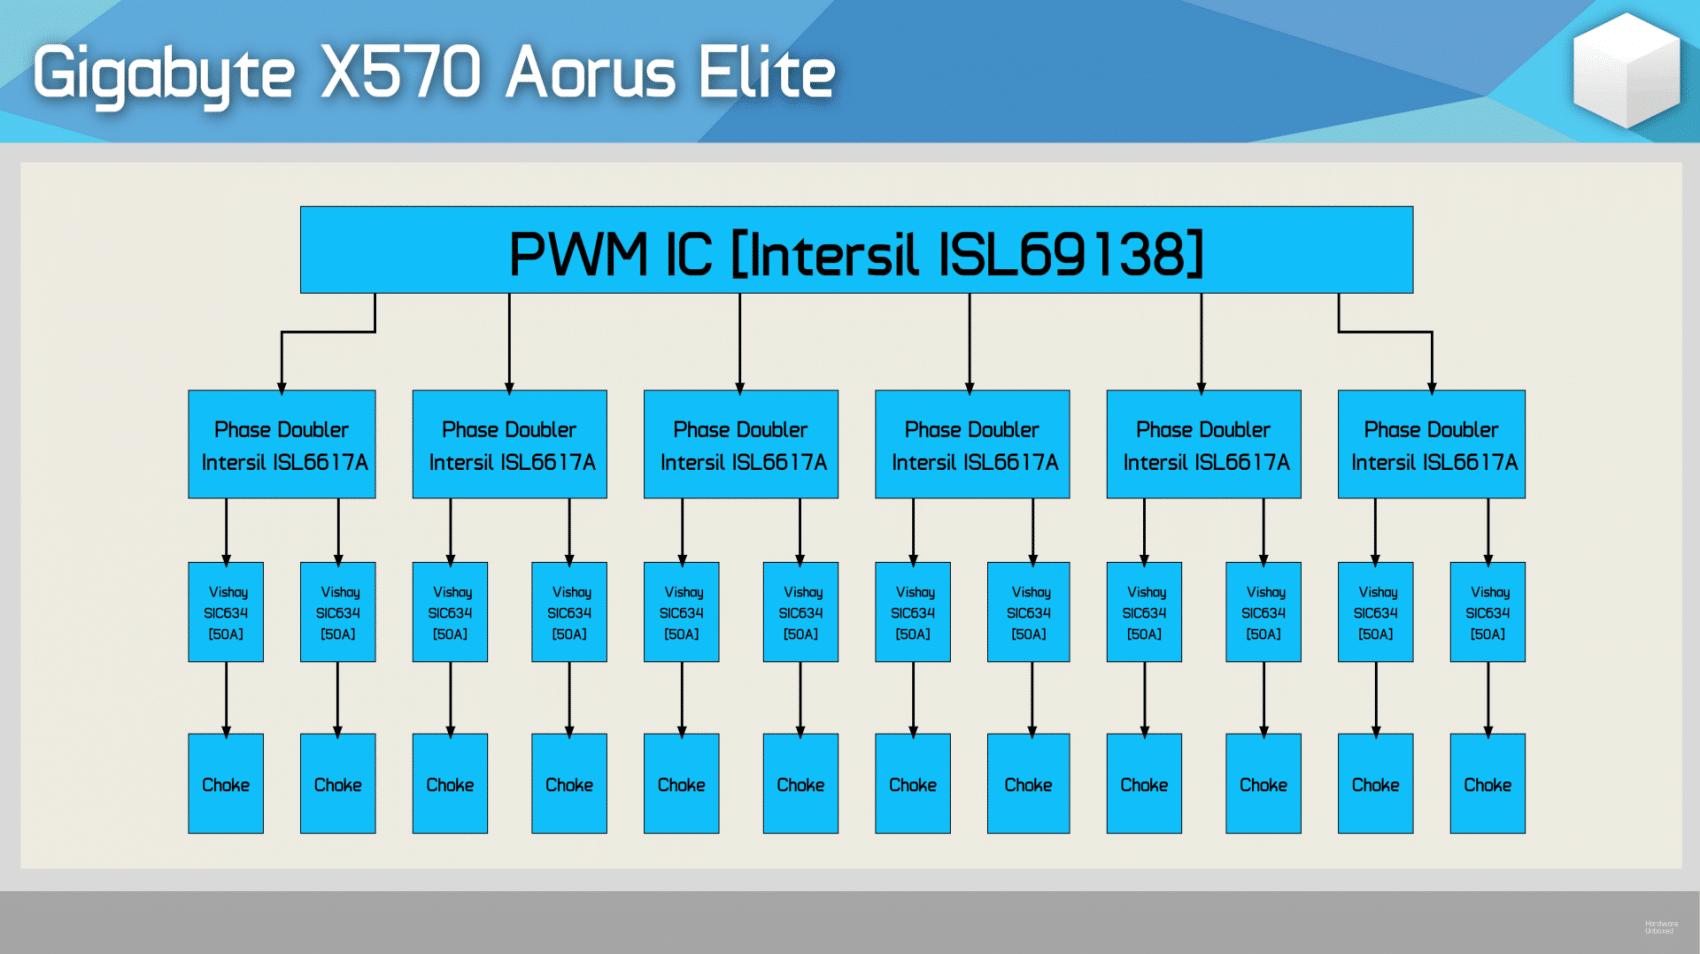 VRM Gigabyte X570 AORUS Elite